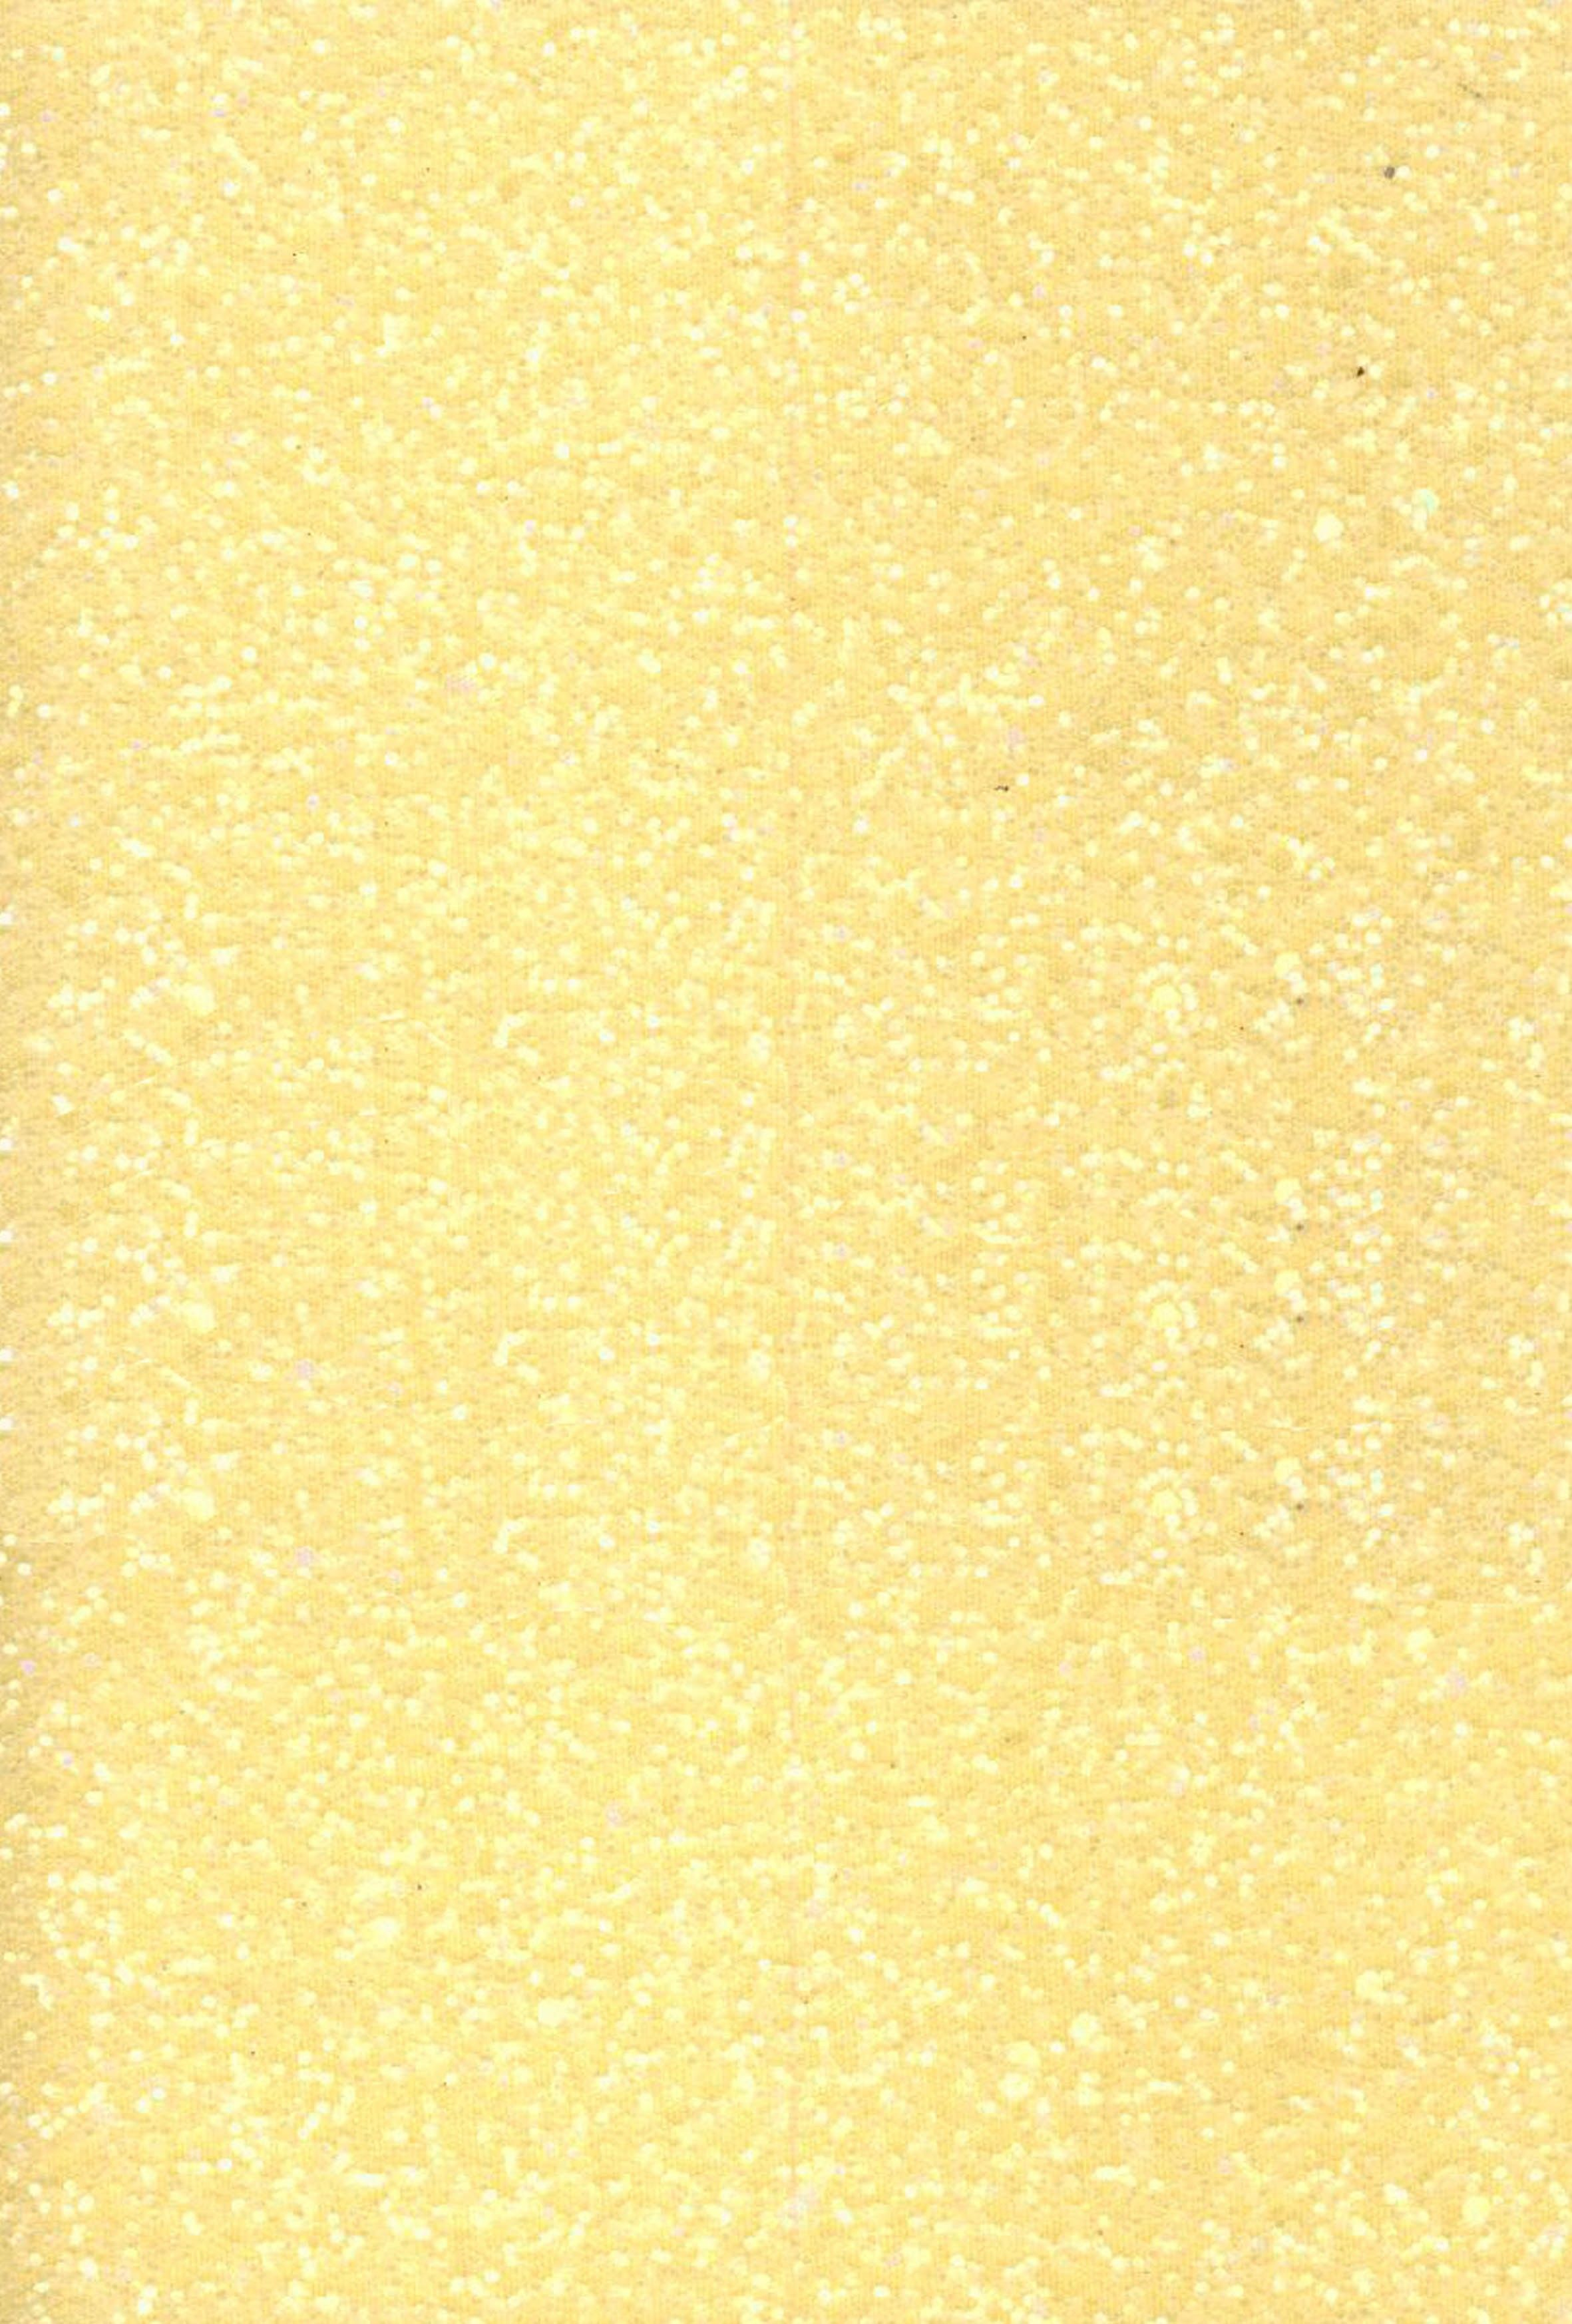 yellow glitter wallpaper | My Style | Pinterest | Glitter wallpaper ...